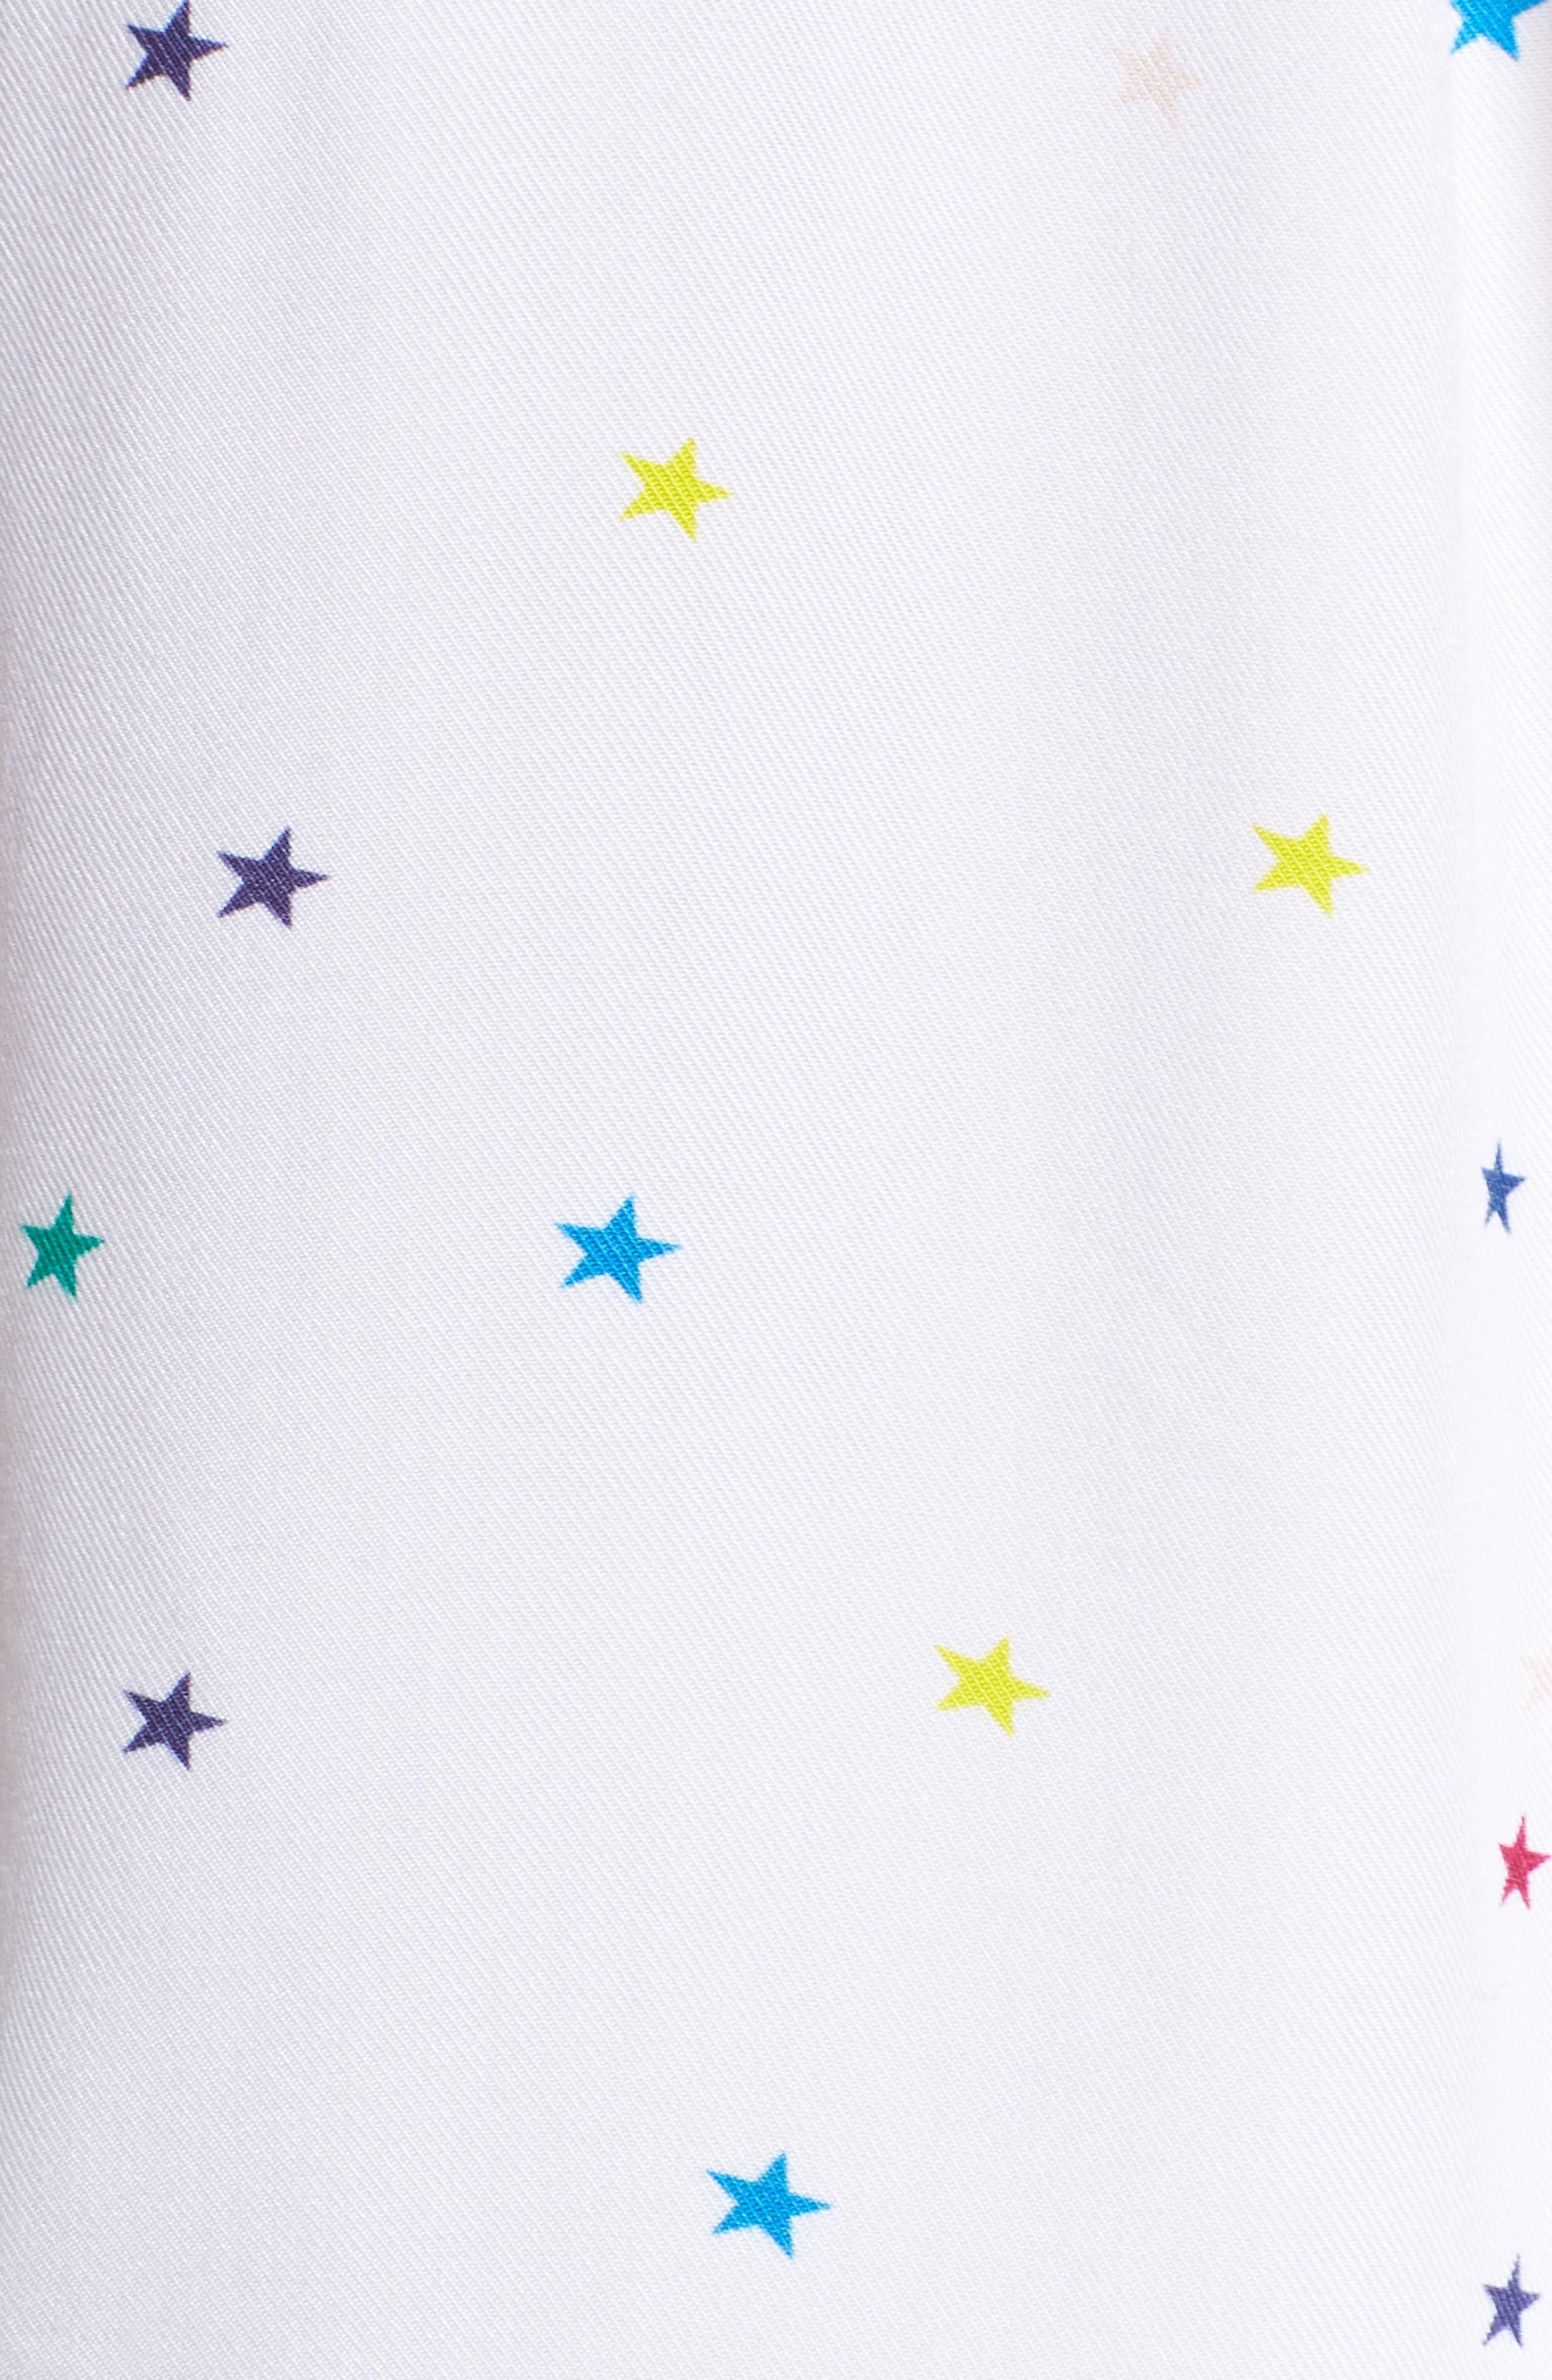 Star Print Short Pajamas,                             Alternate thumbnail 6, color,                             Rainbow Stars On White